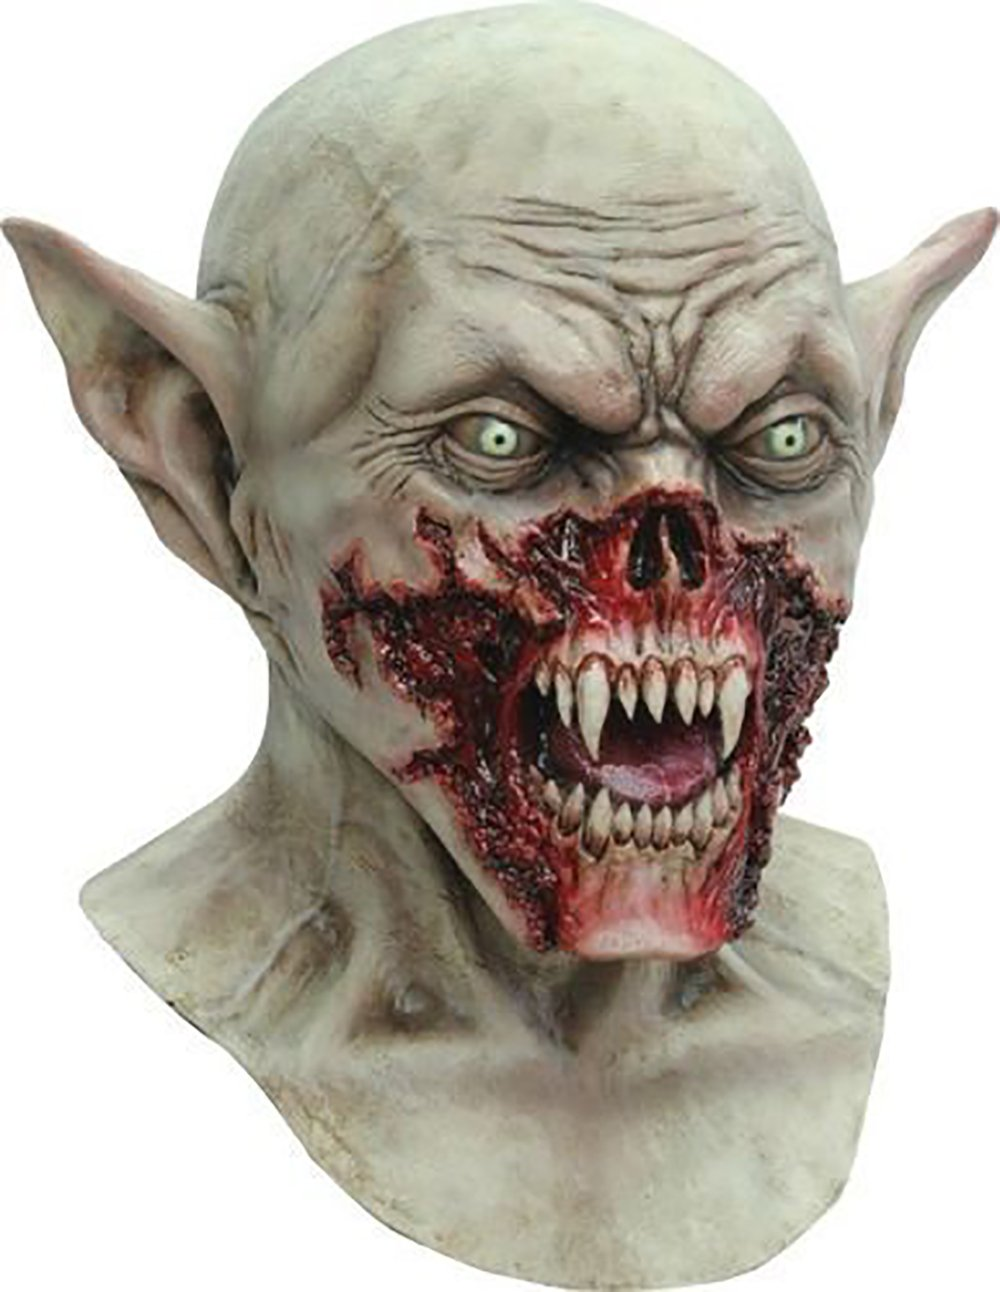 Vampire Mask Kurten Demon Zombie Scary Adult Halloween Costume Party